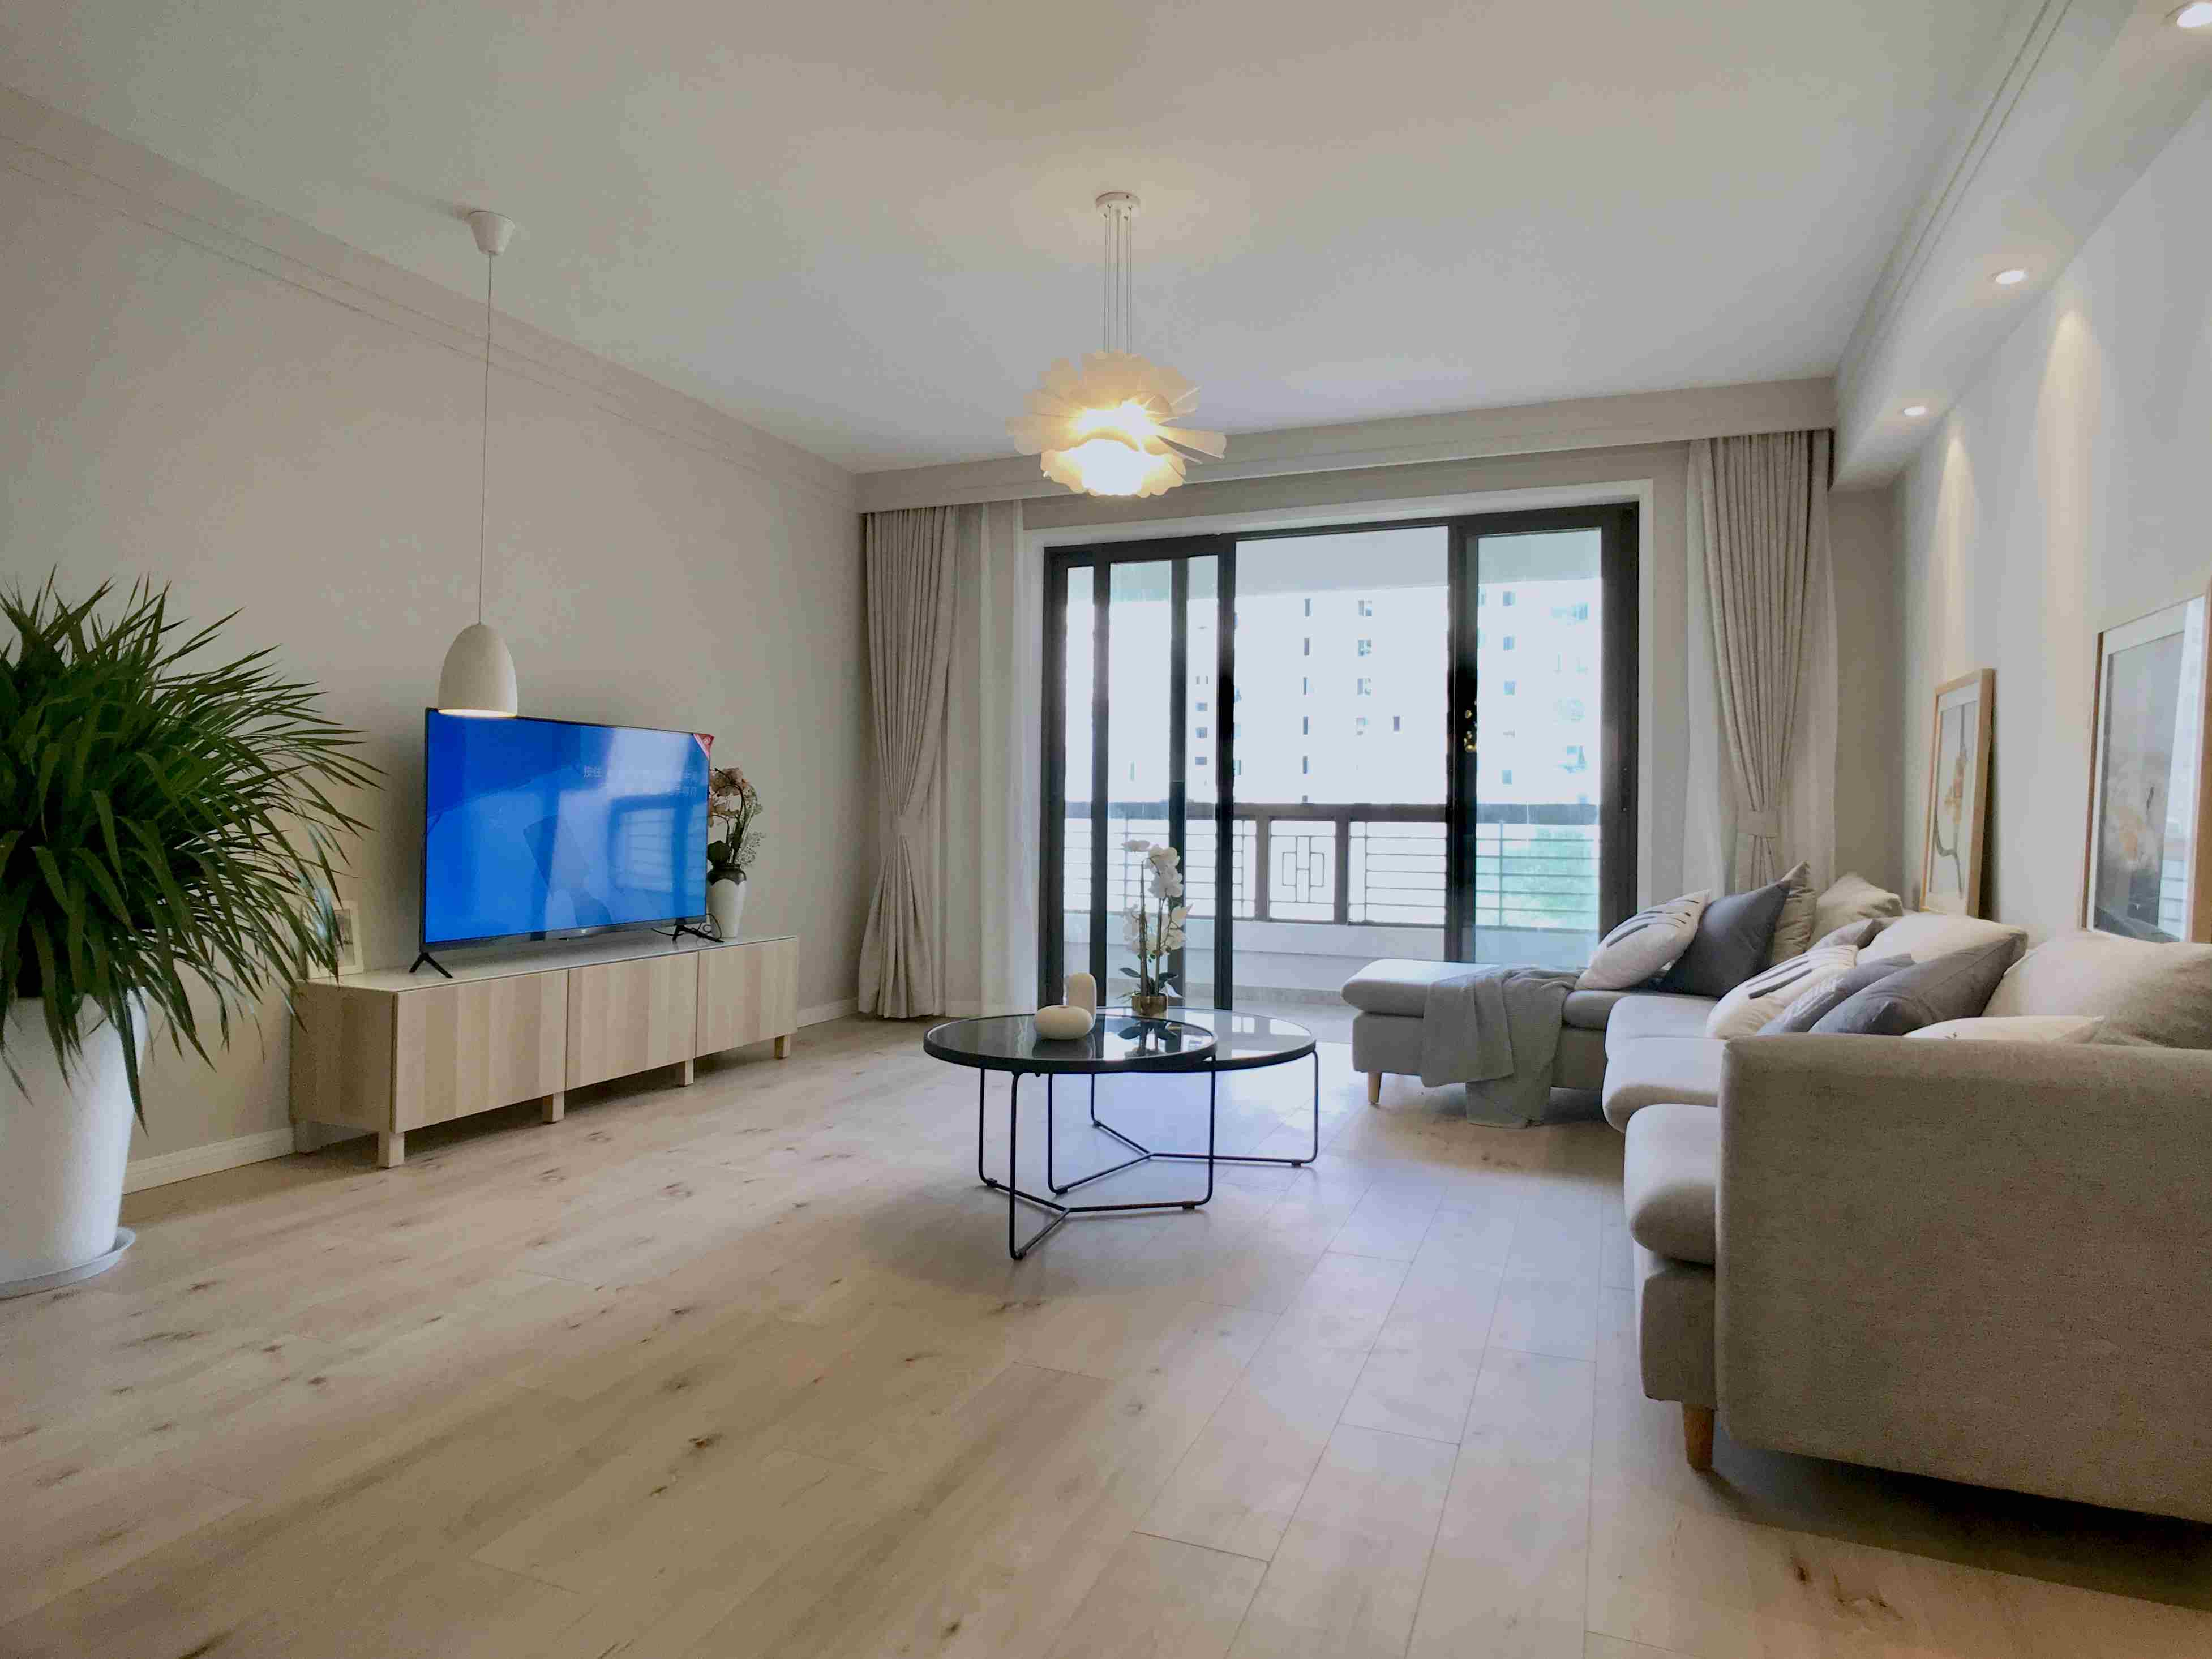 Apartment for rent Shanghai near Xintiandi flat rental